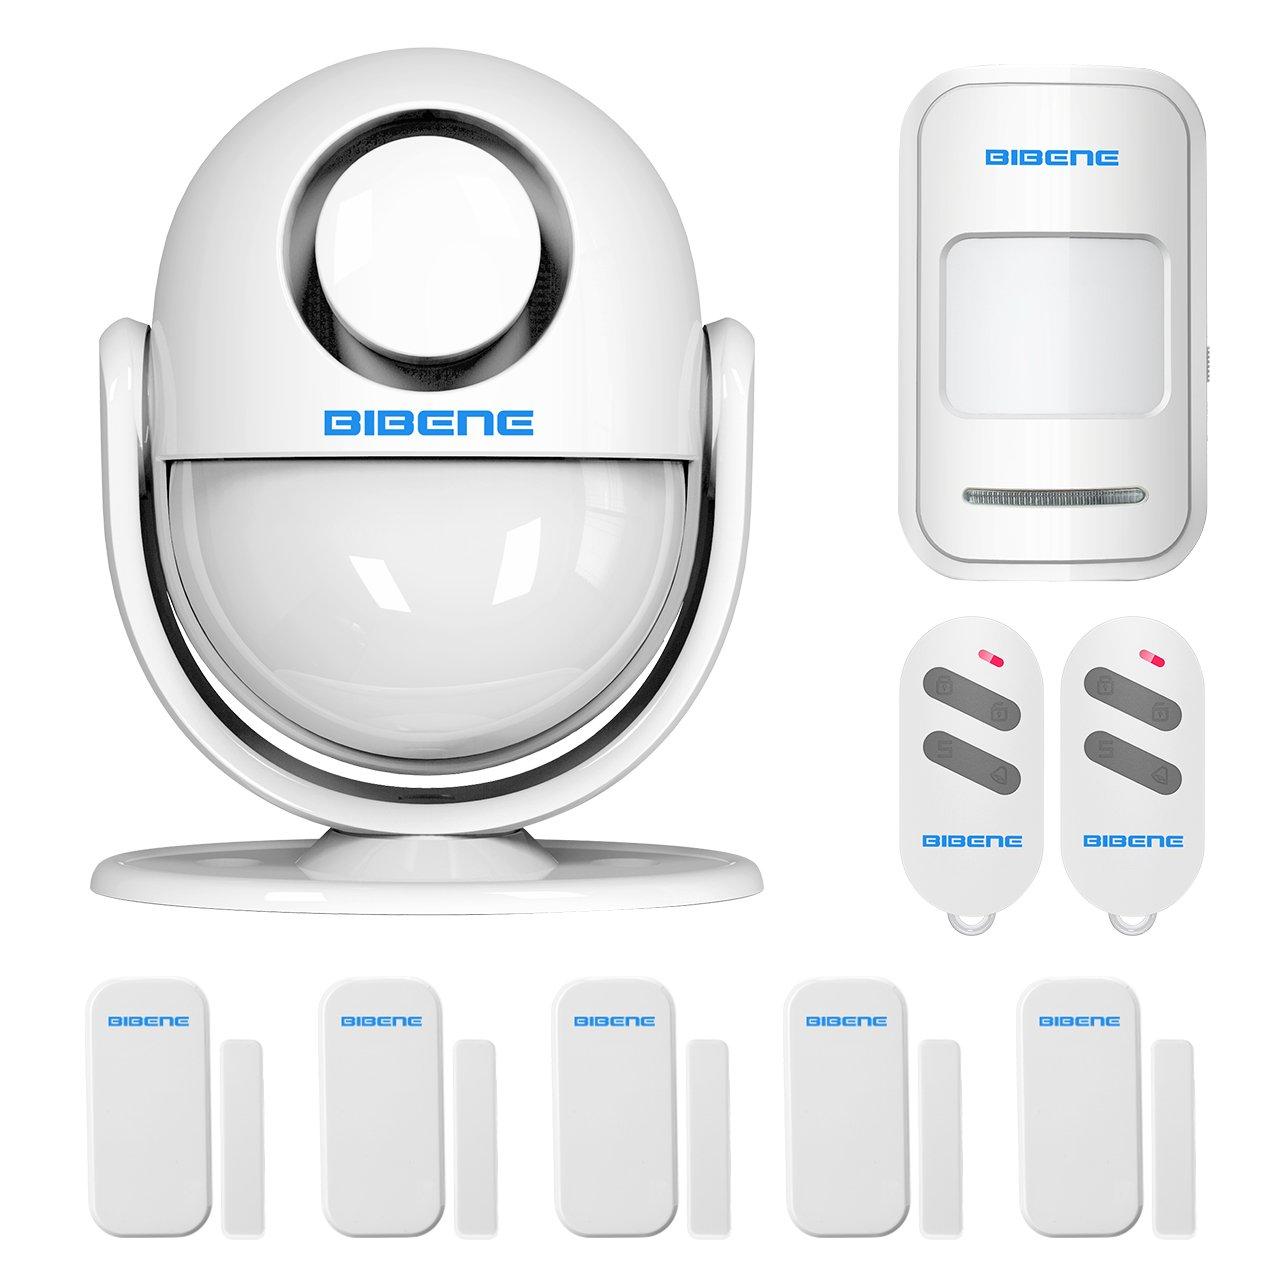 BIBENE 2.4G WIFI Home Security Alarm System DIY KIT with Easy App, 2-in-1 PIR Main Panel,0-120dB, 3Modes Control Burglar Alert for IOS Andrioid Smartphone with PIR Motion Sensor,Door Contact Sensor